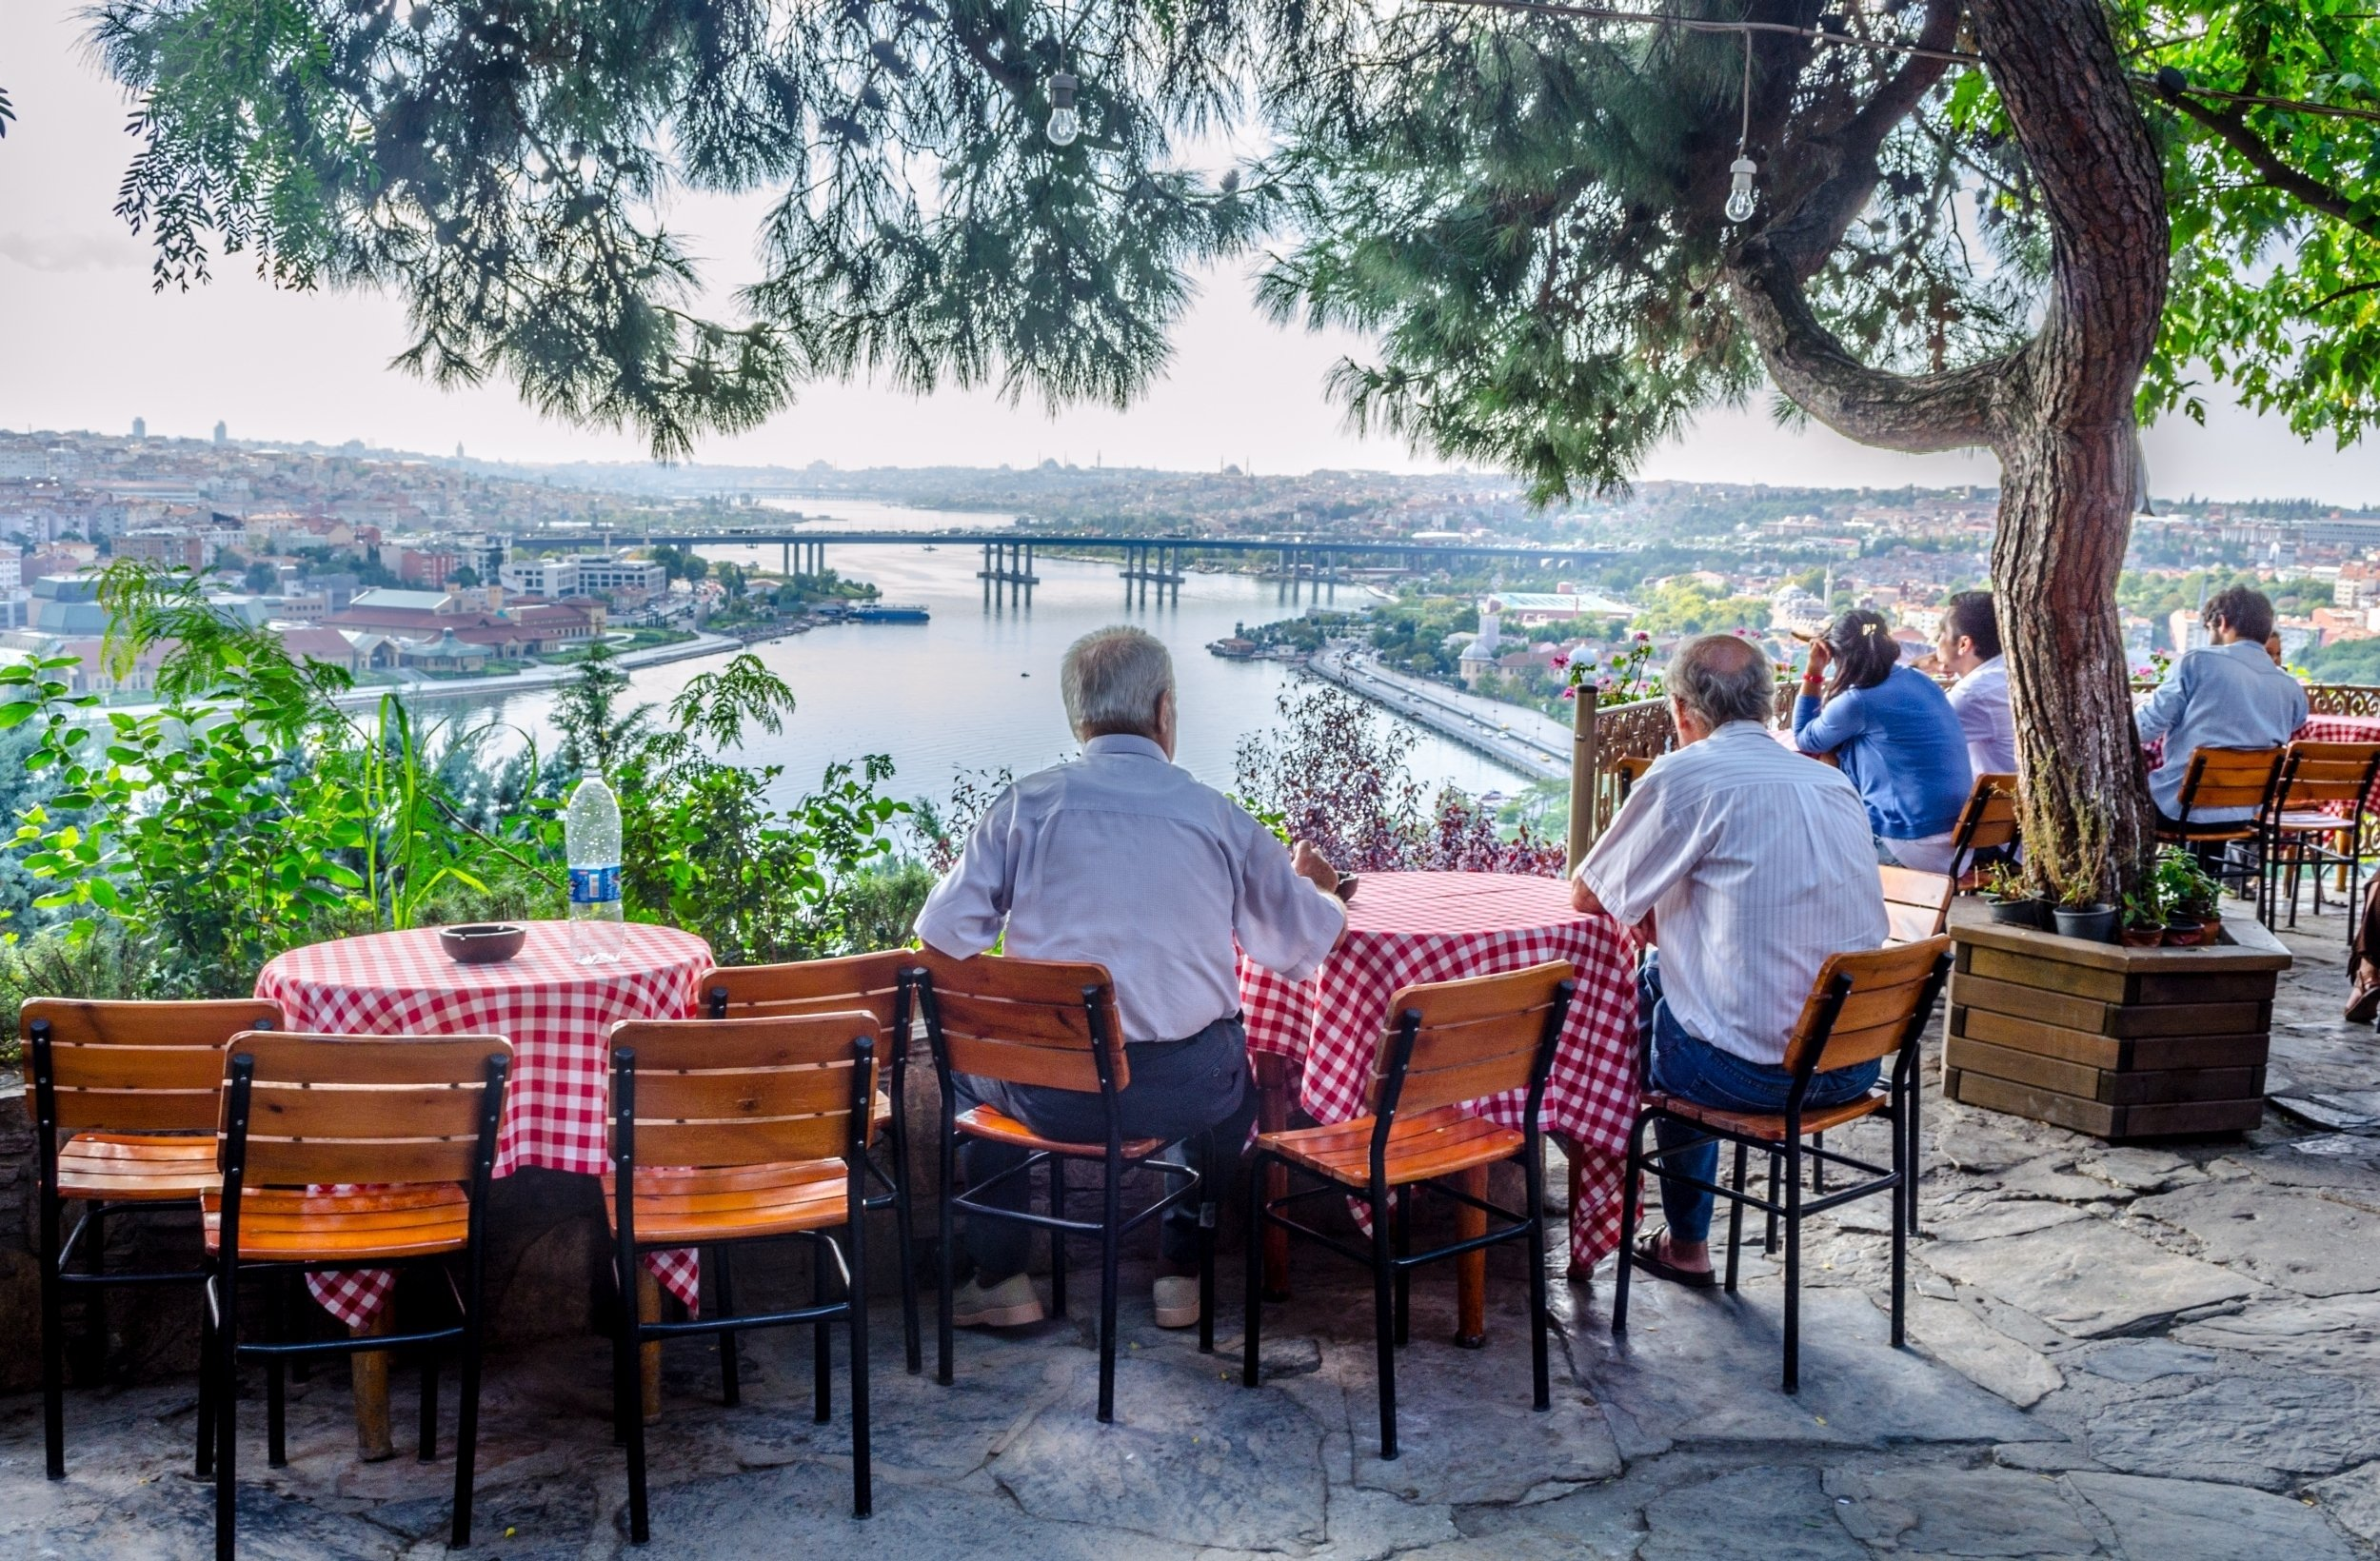 Pierre Loti Hill, in the Eyüp district, Istanbul, Turkey, Aug. 23, 2010. (Shutterstock Photo)